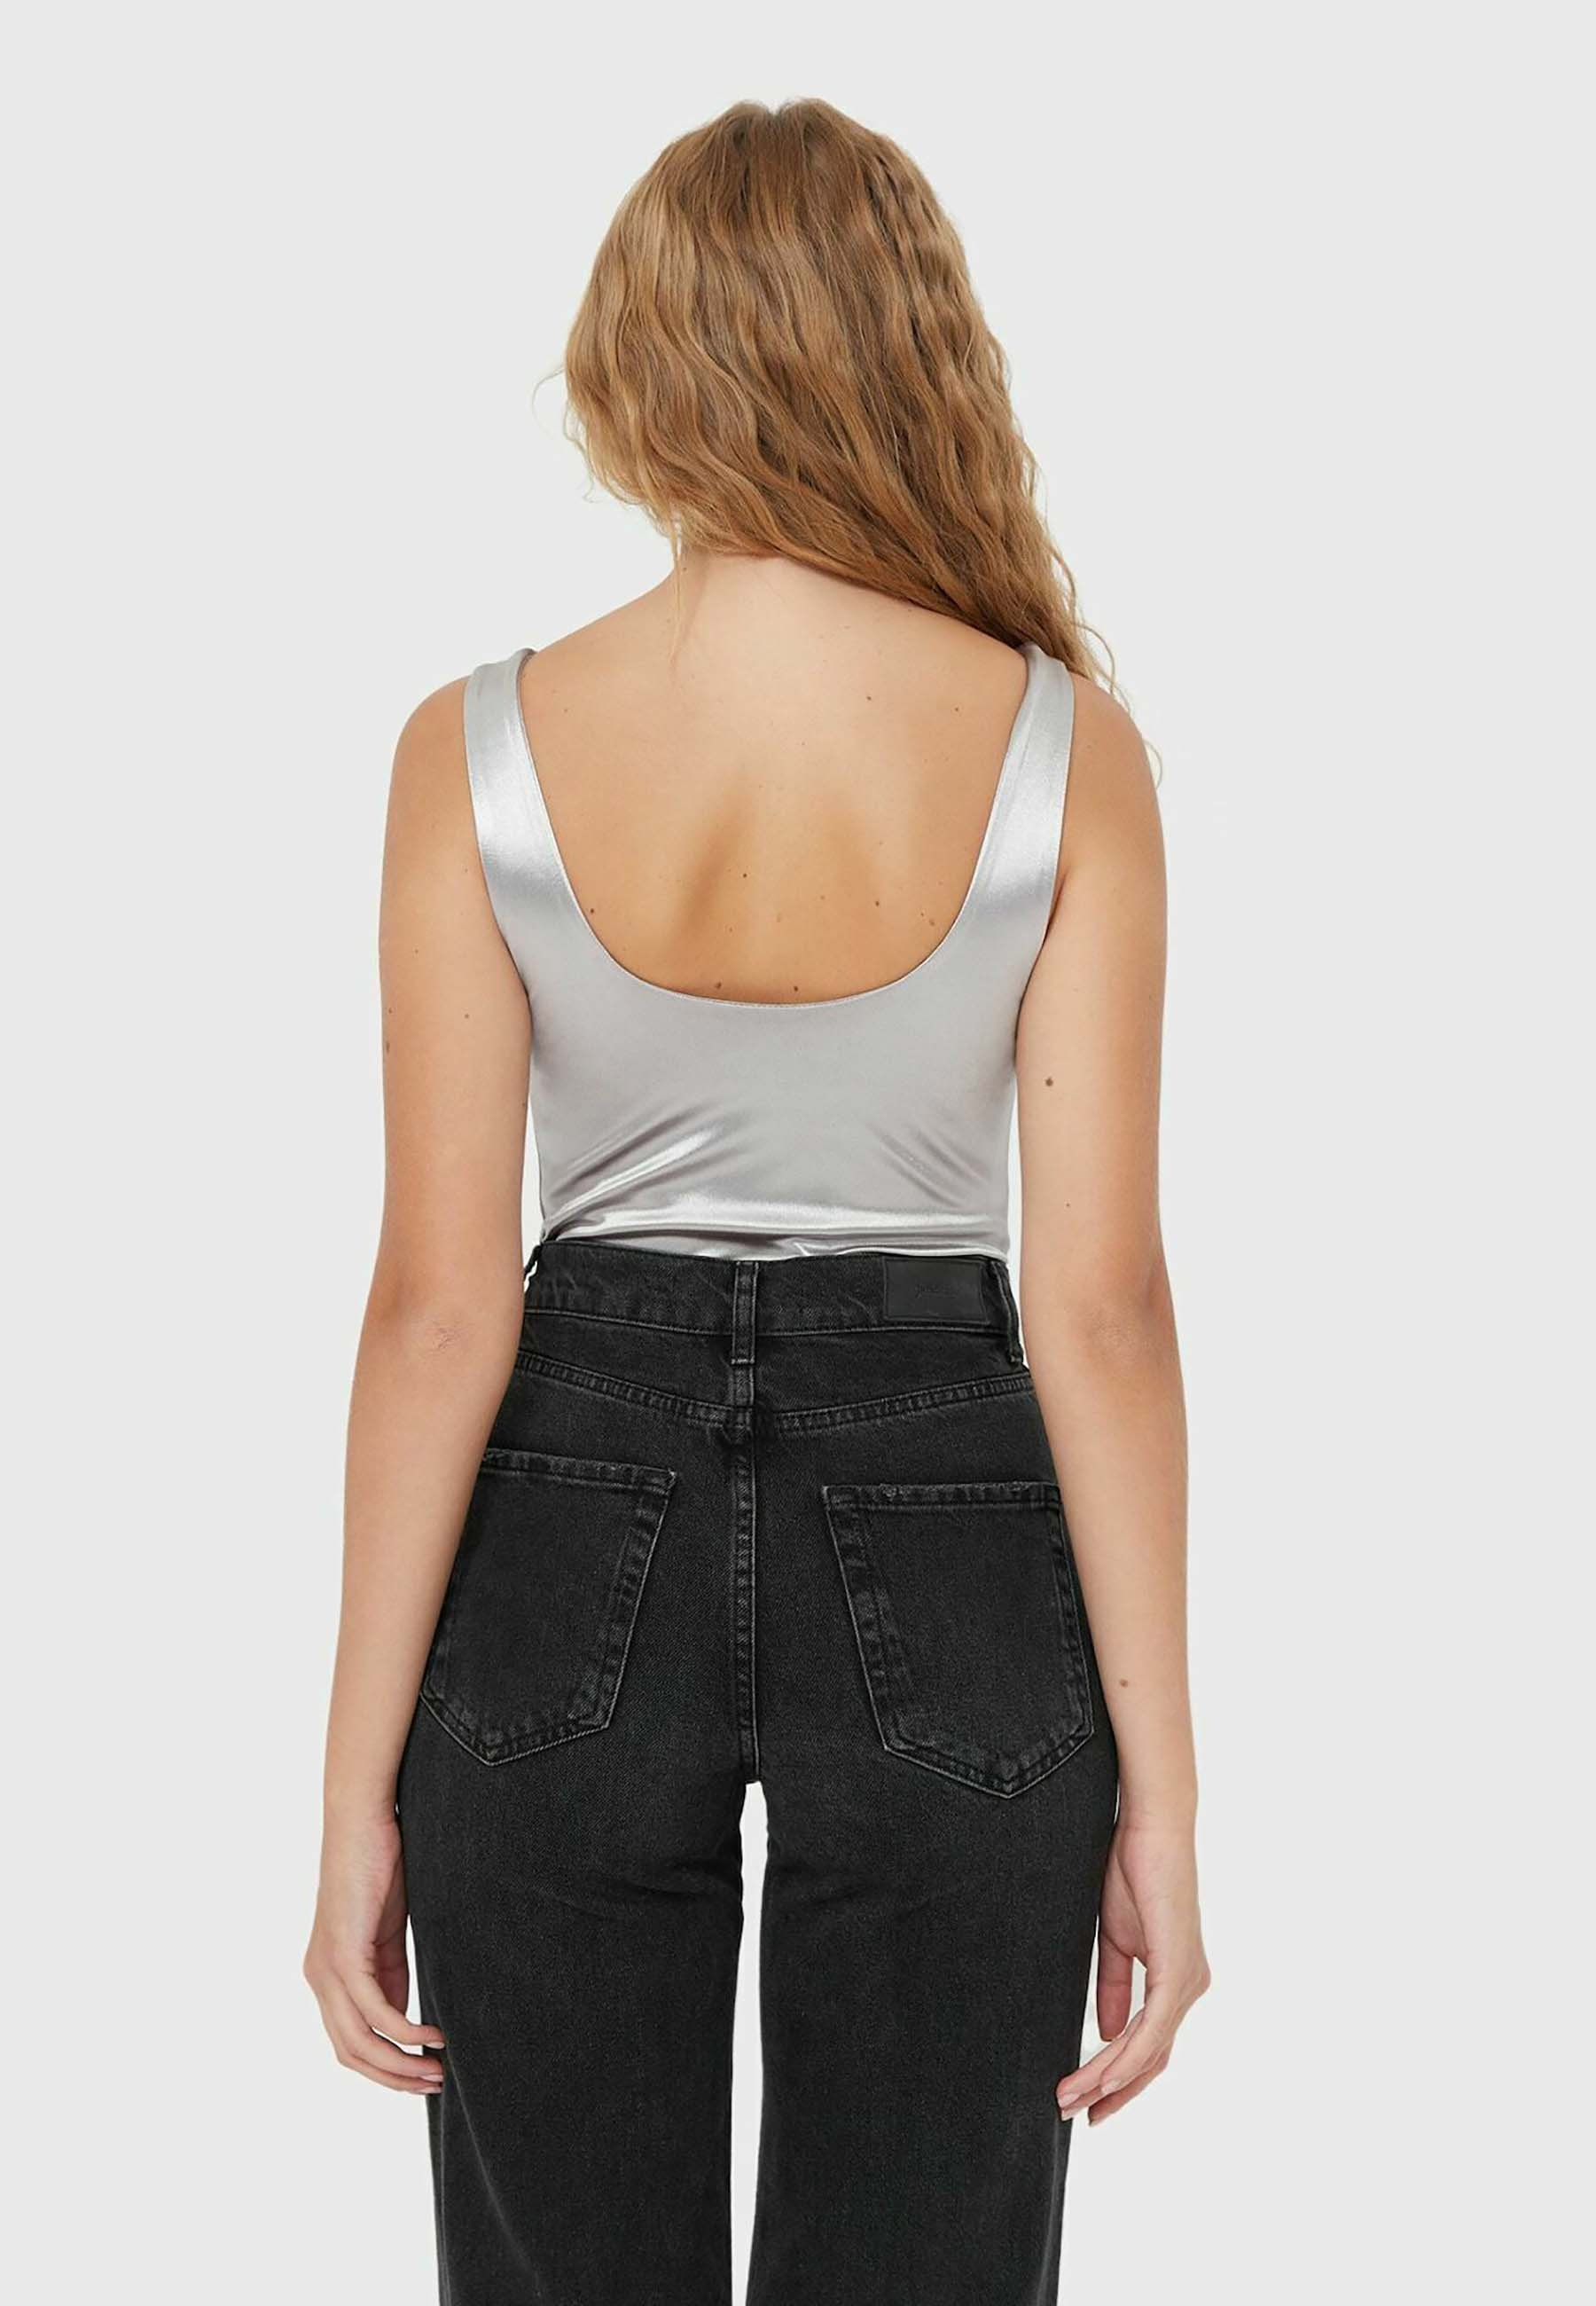 Damen BODY MIT METALLIC-FINISH  - Badeanzug